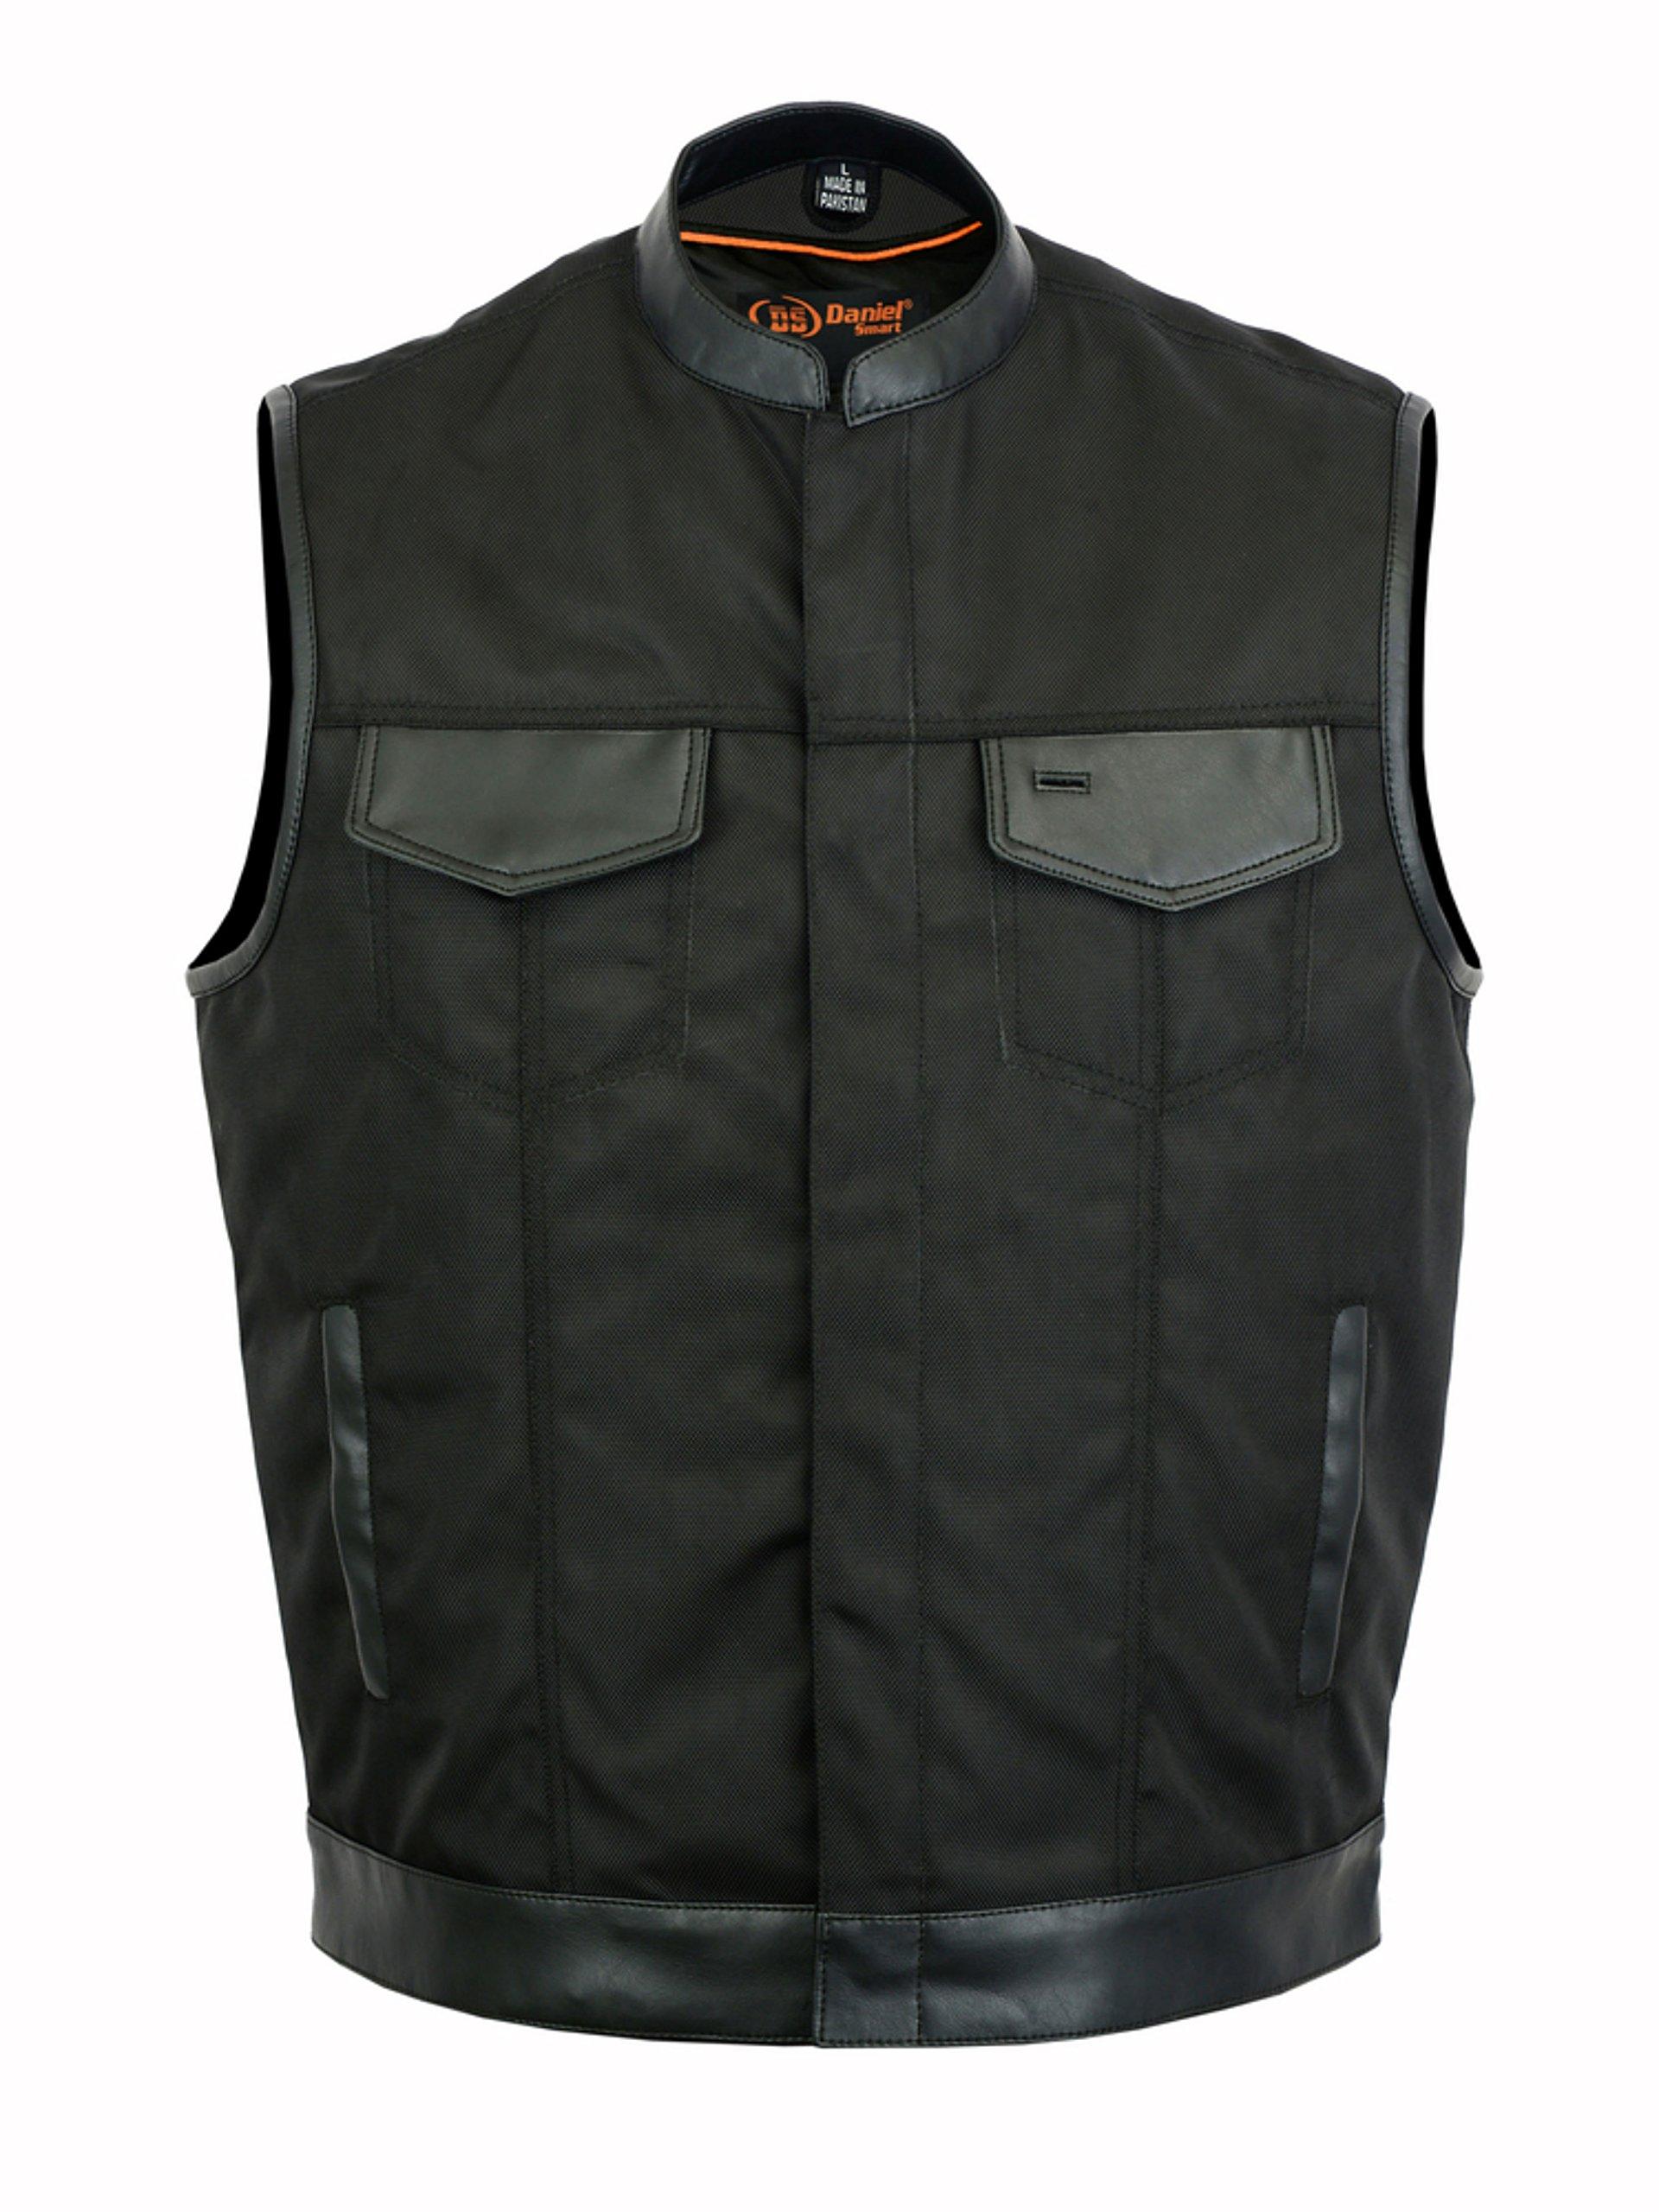 DS689 Concealed Snap Closure, Textile Material, Scoop Collar & Hidden Zipper - Motorcycle Vest